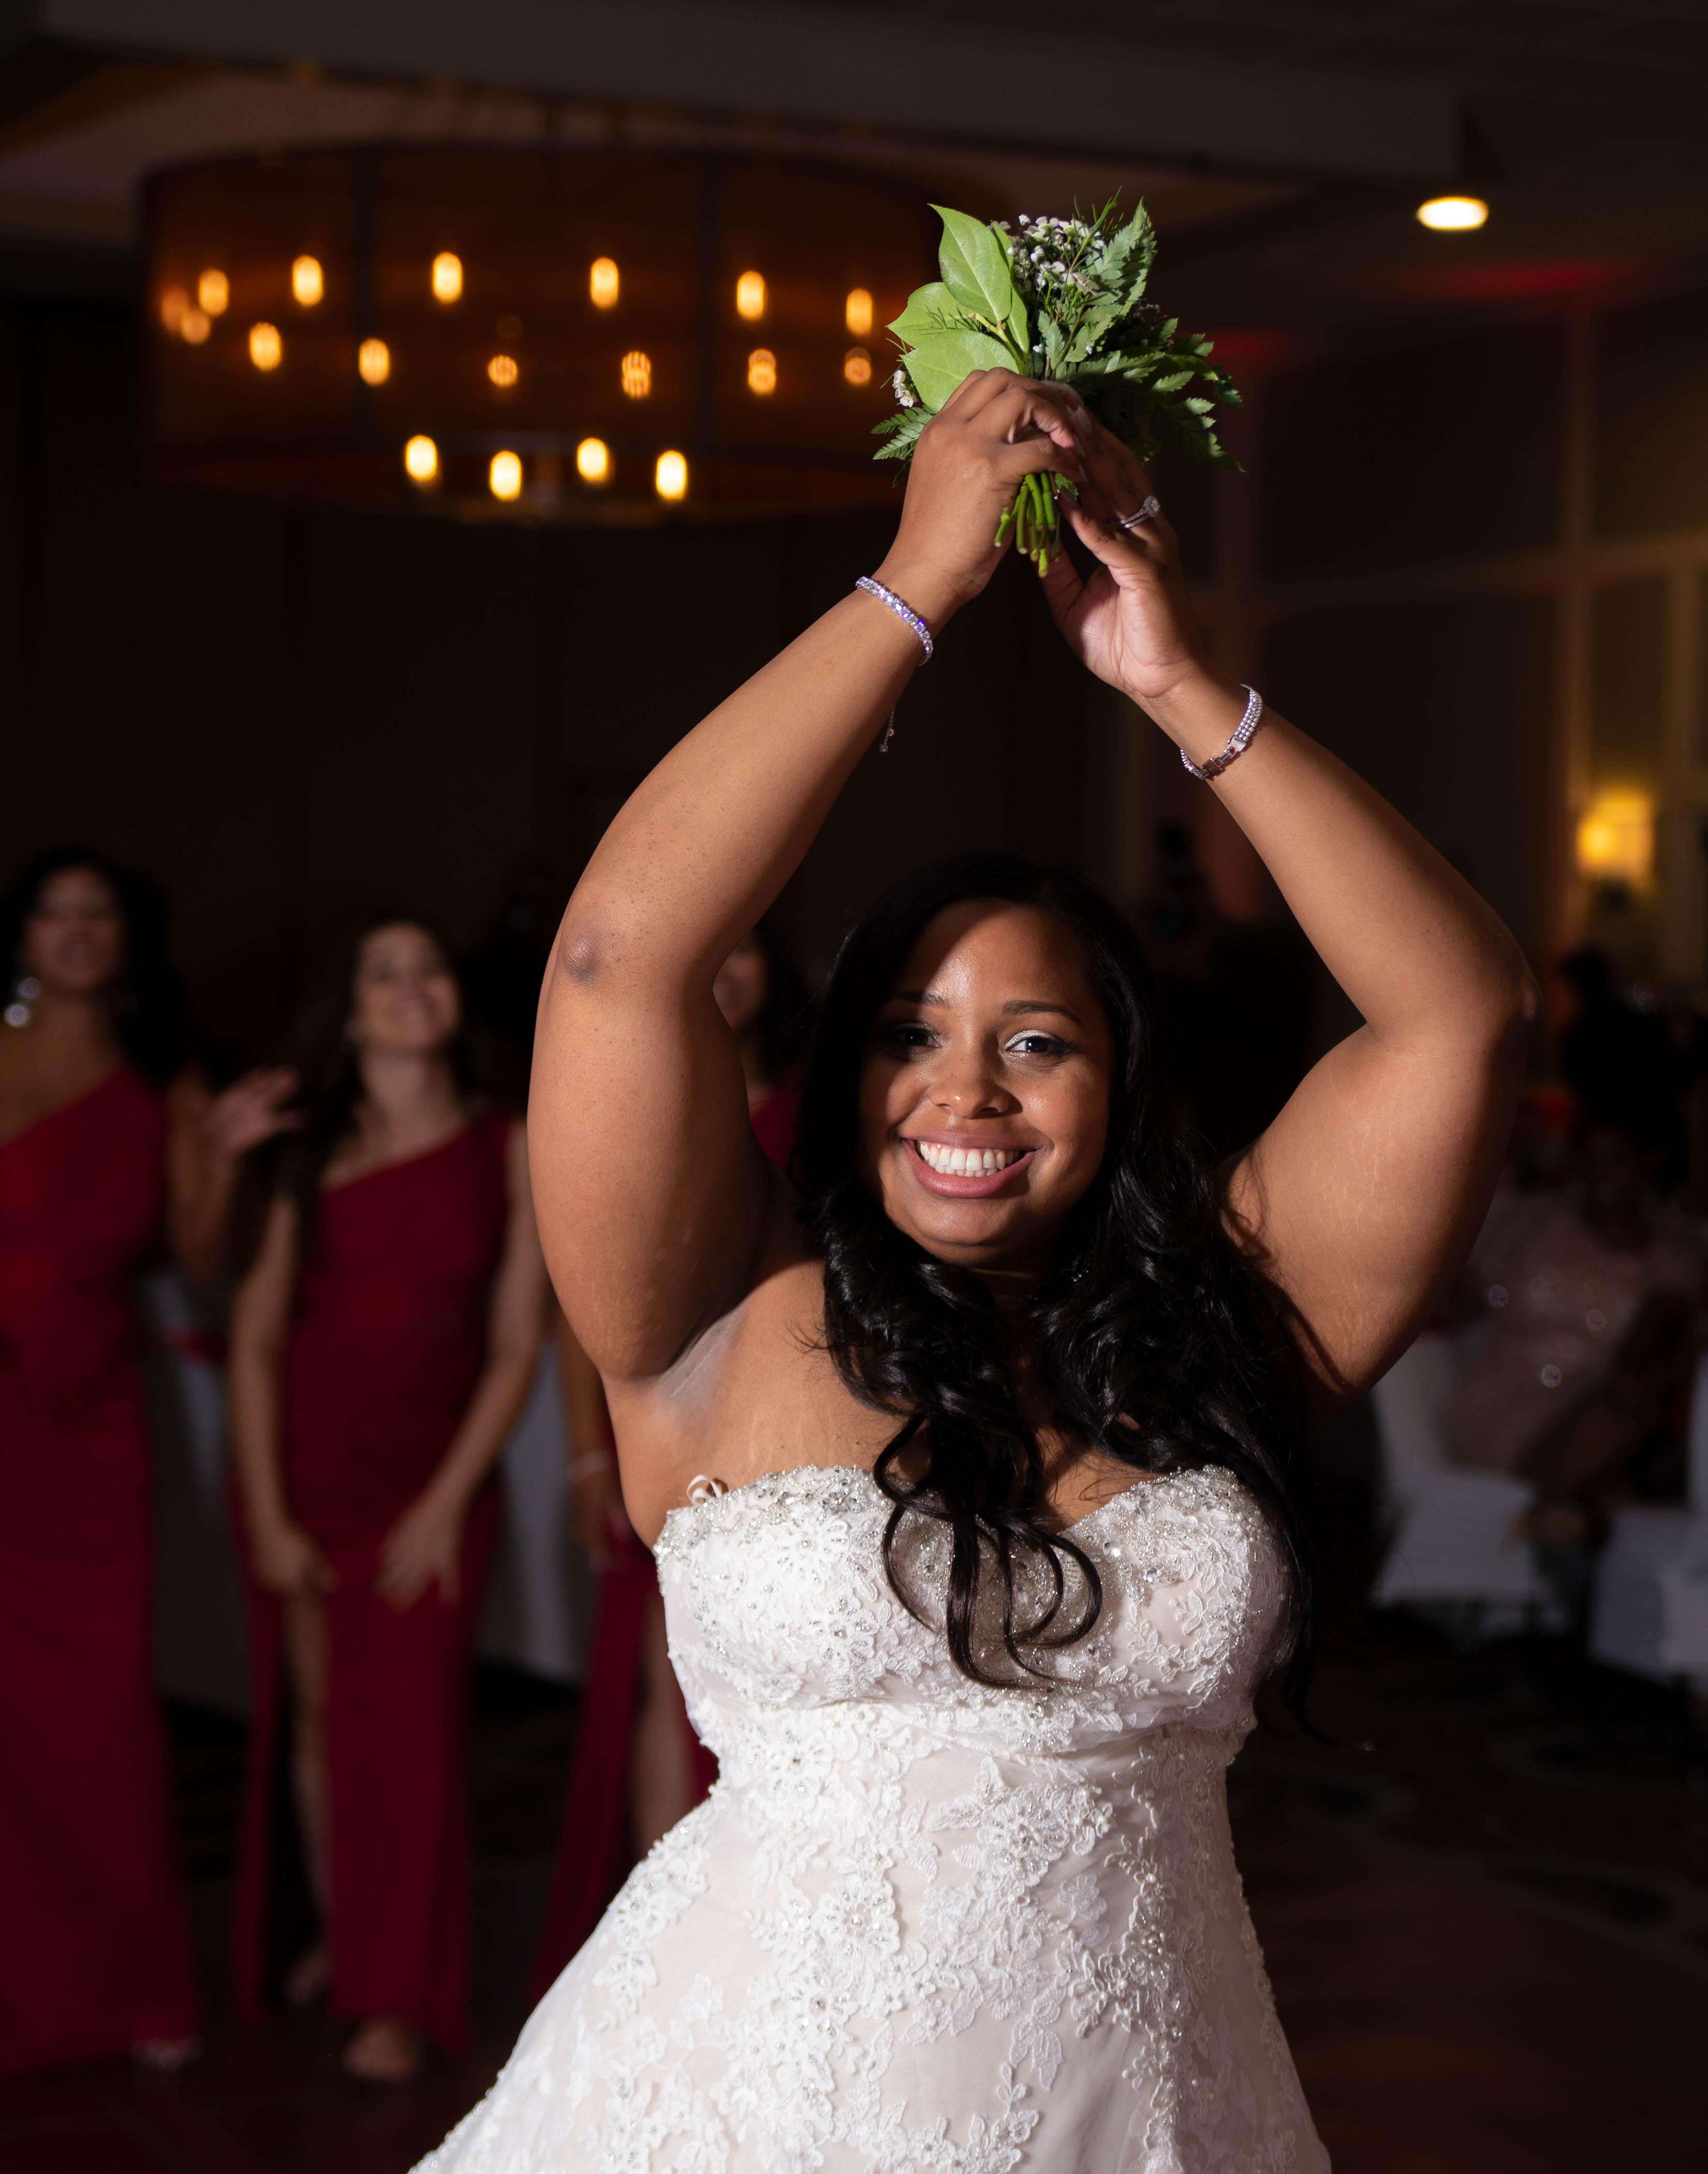 CPH_High-Res-Gaither Wedding2018-79